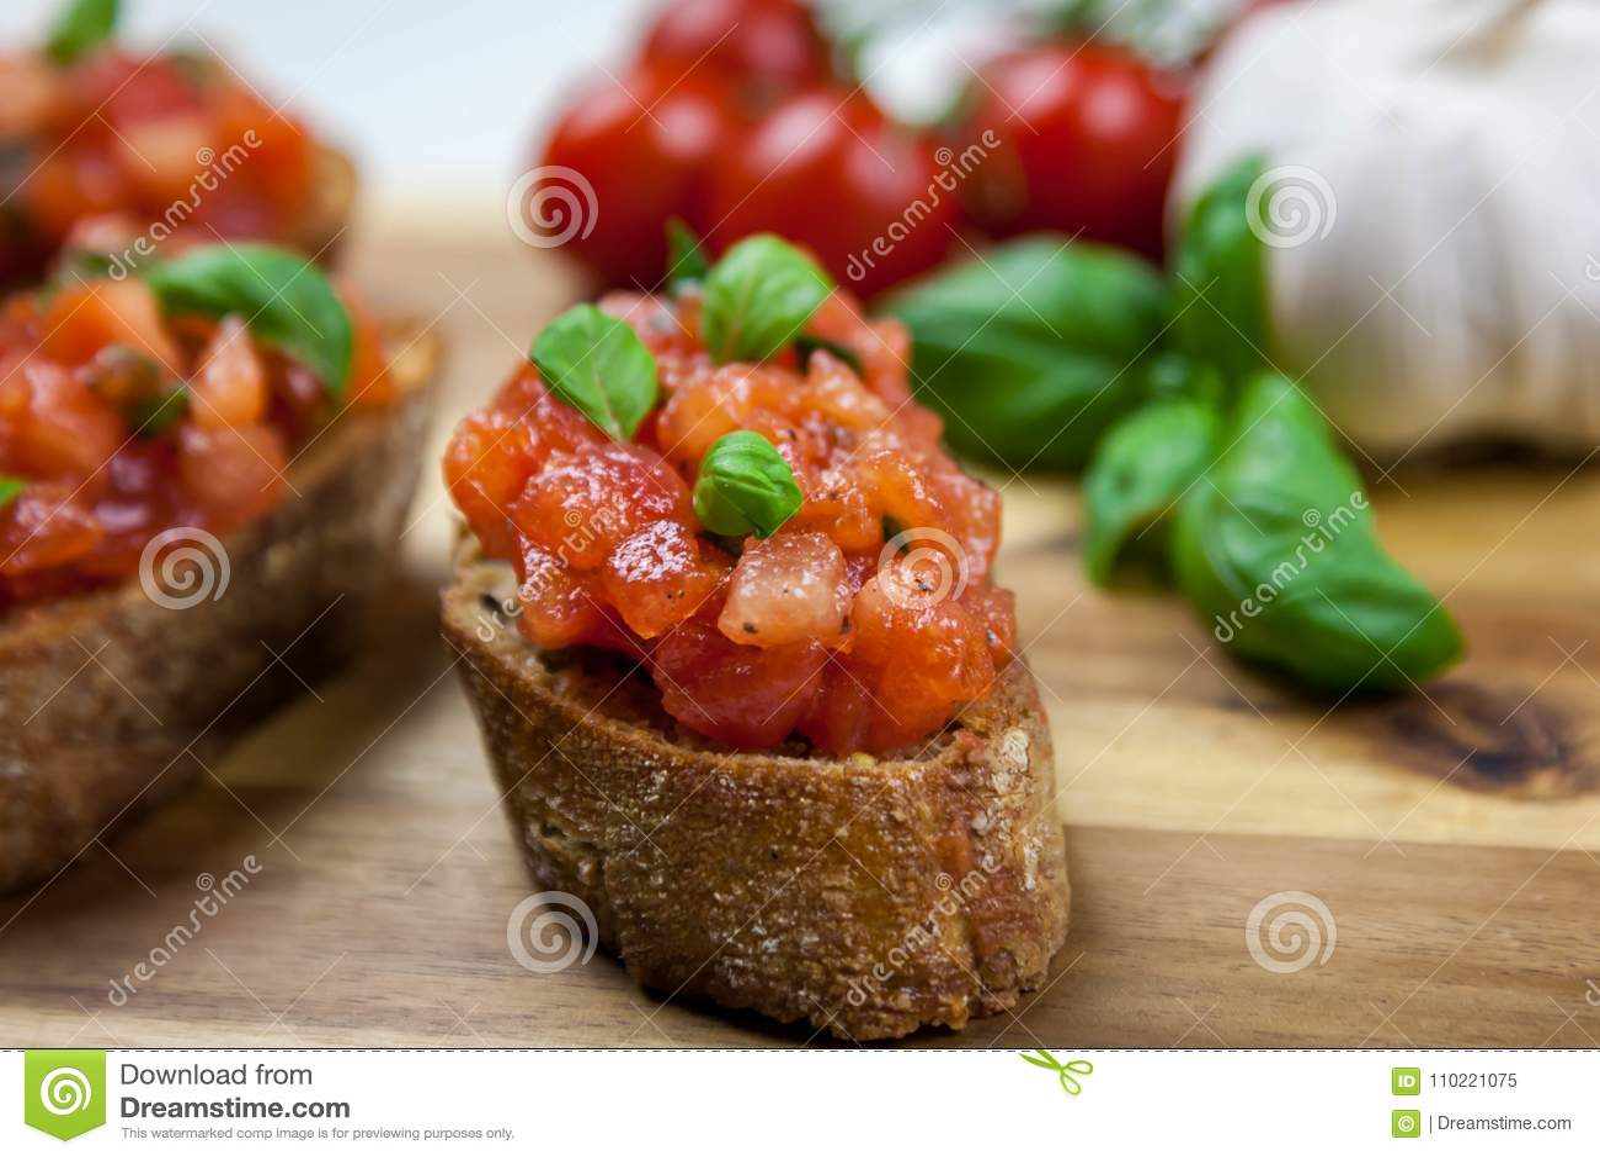 Nourriture italienne saine - bruschette